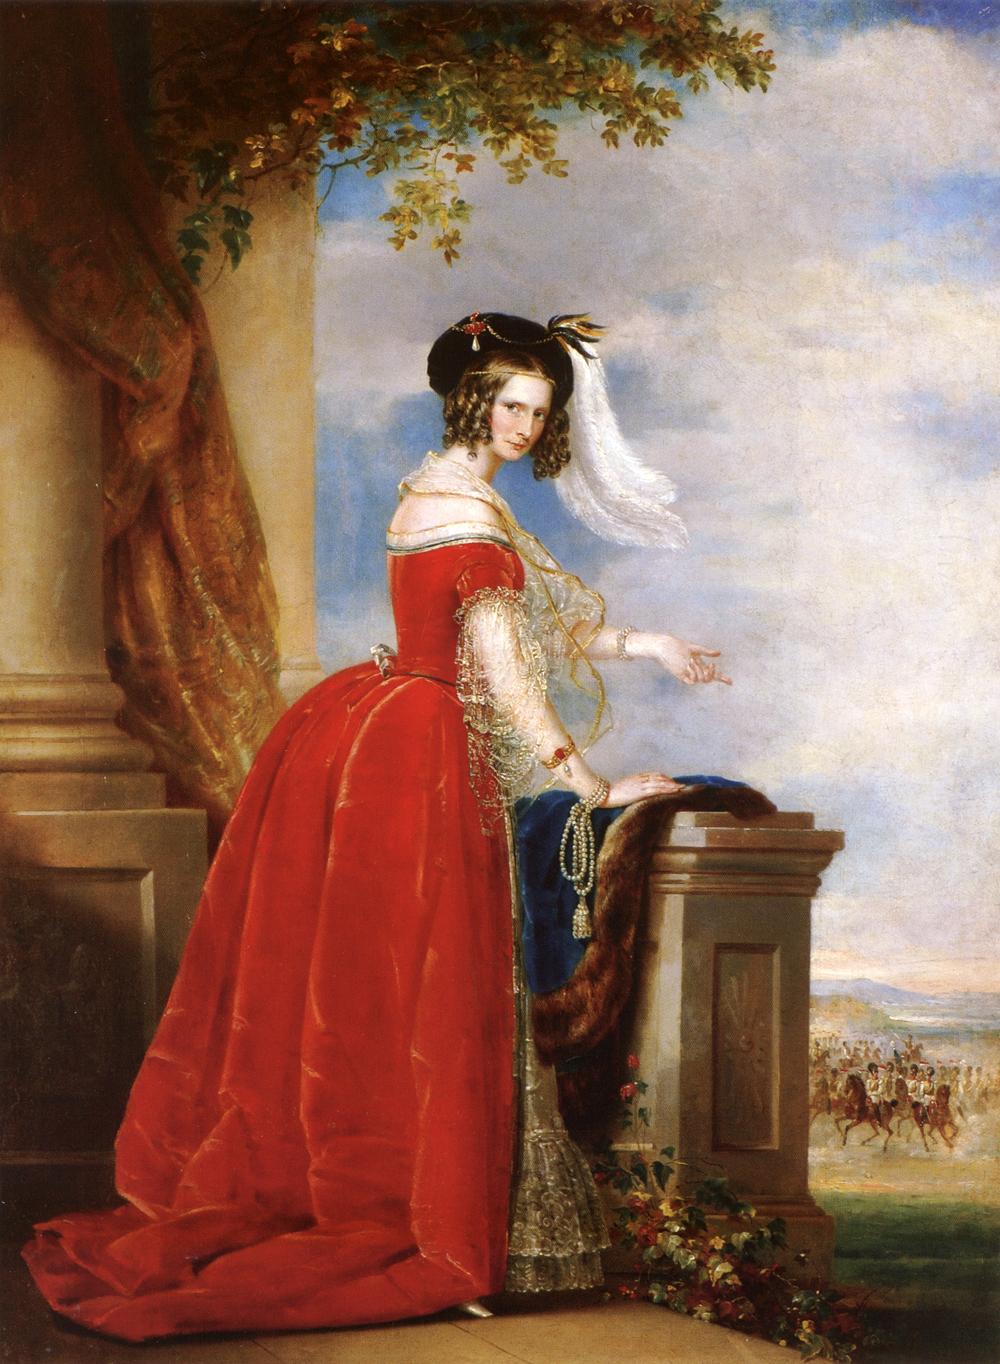 Alexandra Feodorovna (Charlotte of Prussia), 1845